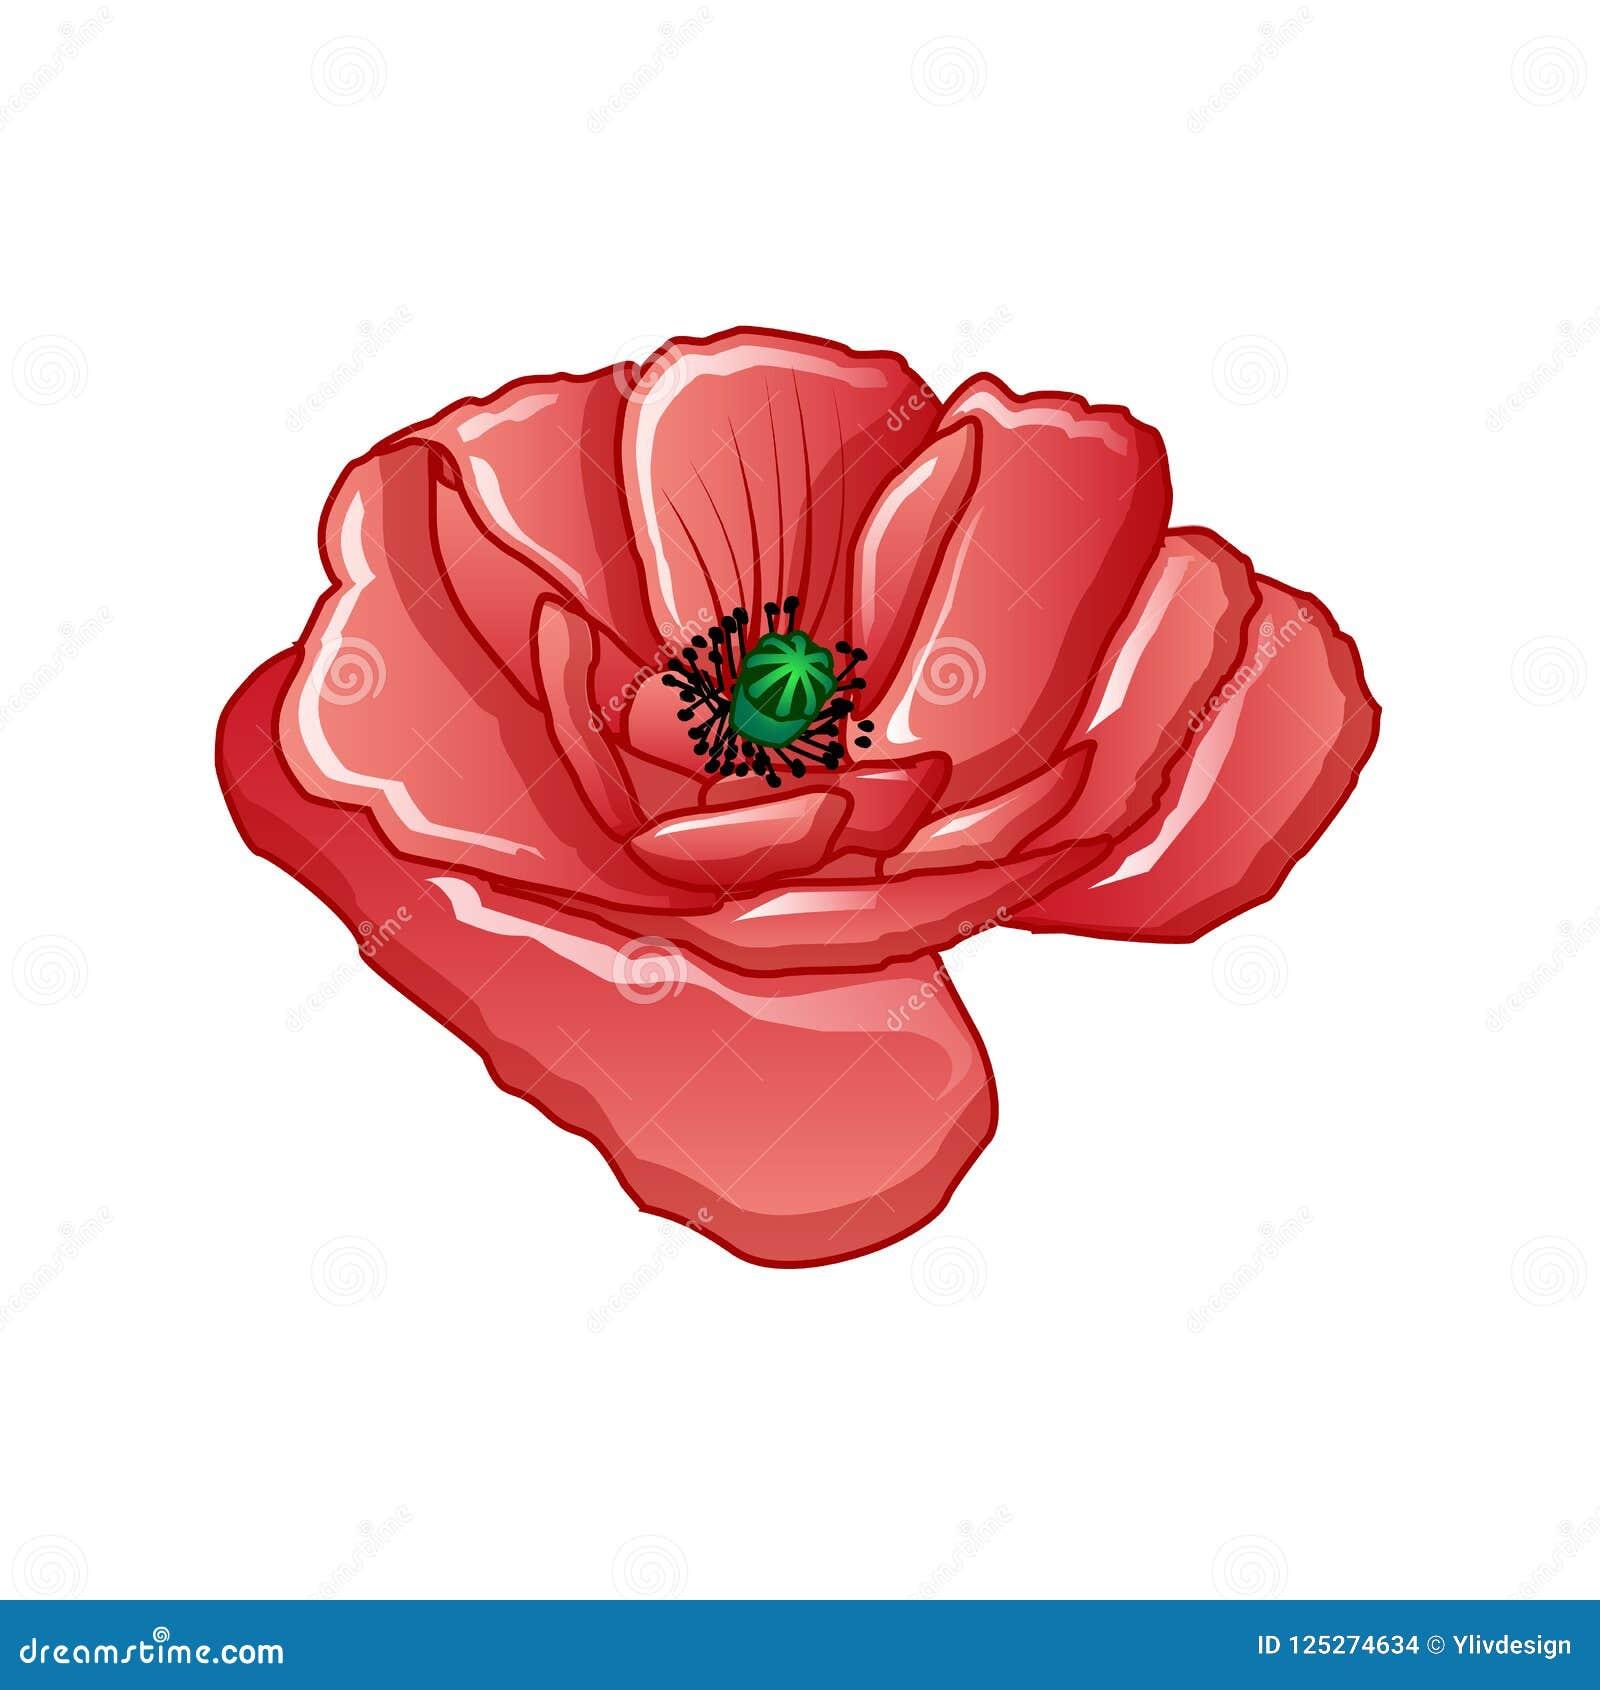 Poppy Flower Icon Cartoon Style Stock Vector Illustration Of